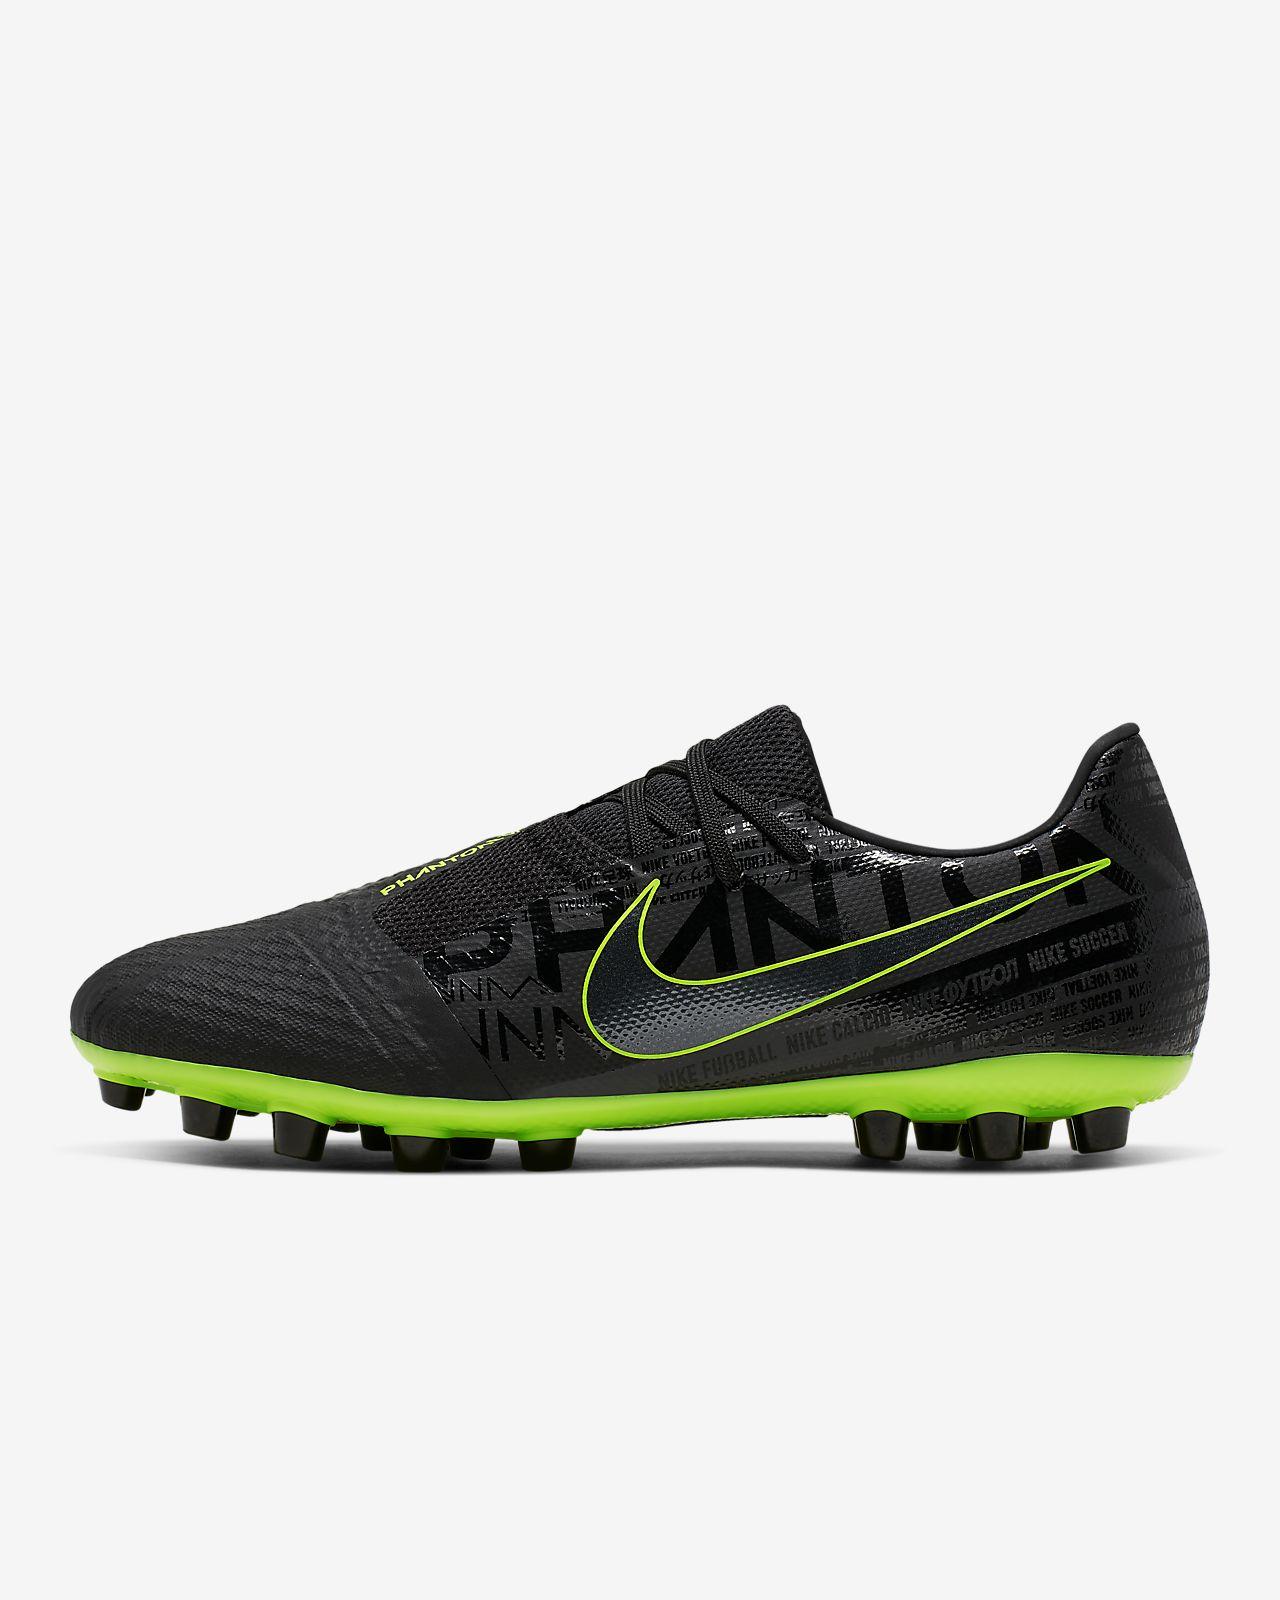 Chaussure de football à crampons pour terrain synthétique Nike Phantom Venom Academy AG